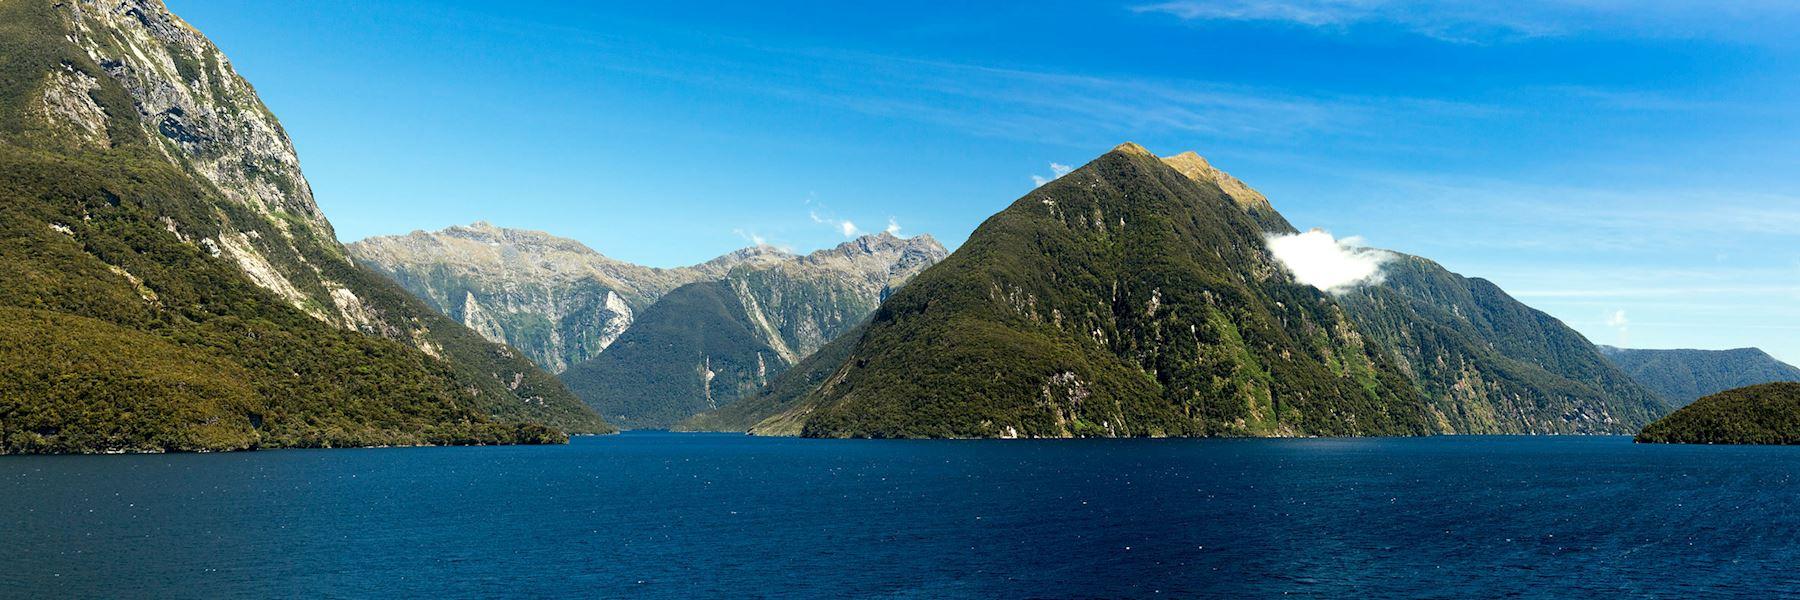 Visit Doubtful Sound, New Zealand